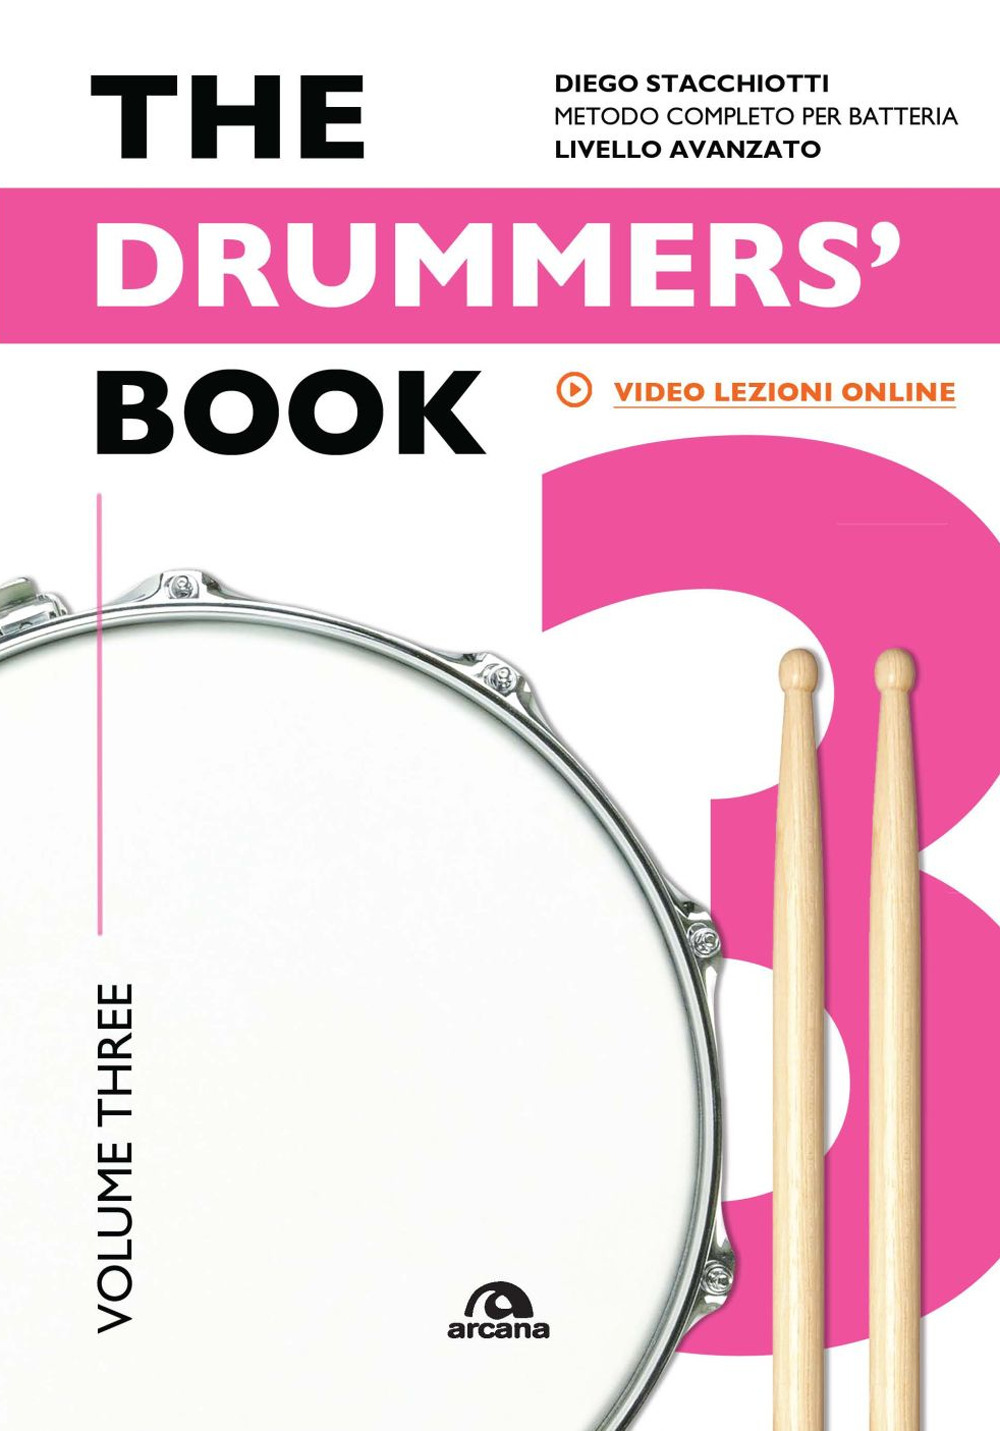 DRUMMERS'S BOOK. METODO COMPLETO PER BATTERIA VOLUME 3 (THE) - Stacchiotti Diego - 9788862319966